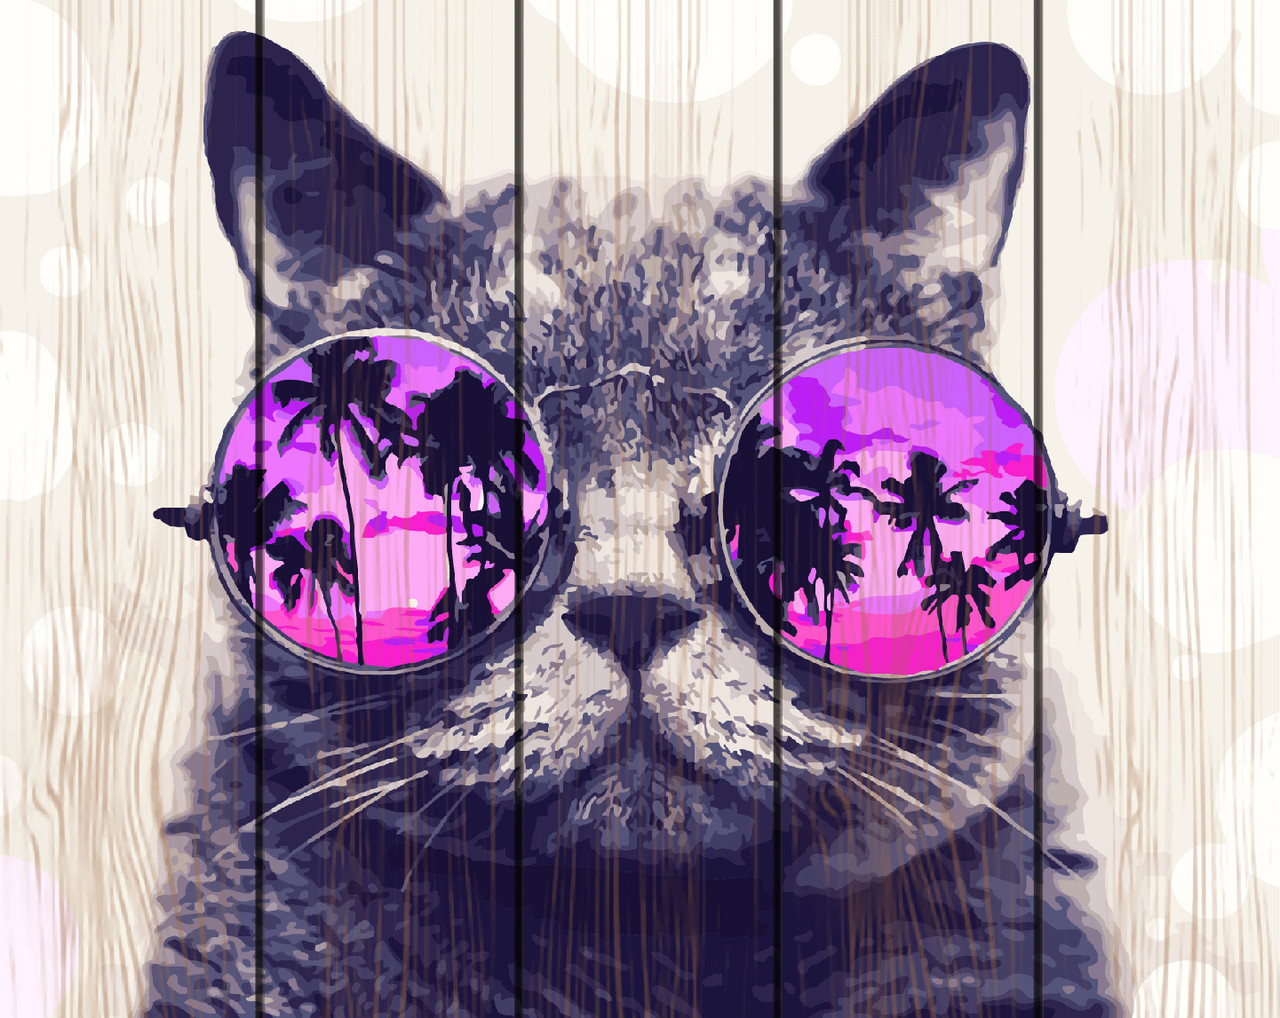 PREMIUM Картина по номерам на дереве 40х50 см. Кот в очках.Тропики Rainbow Art